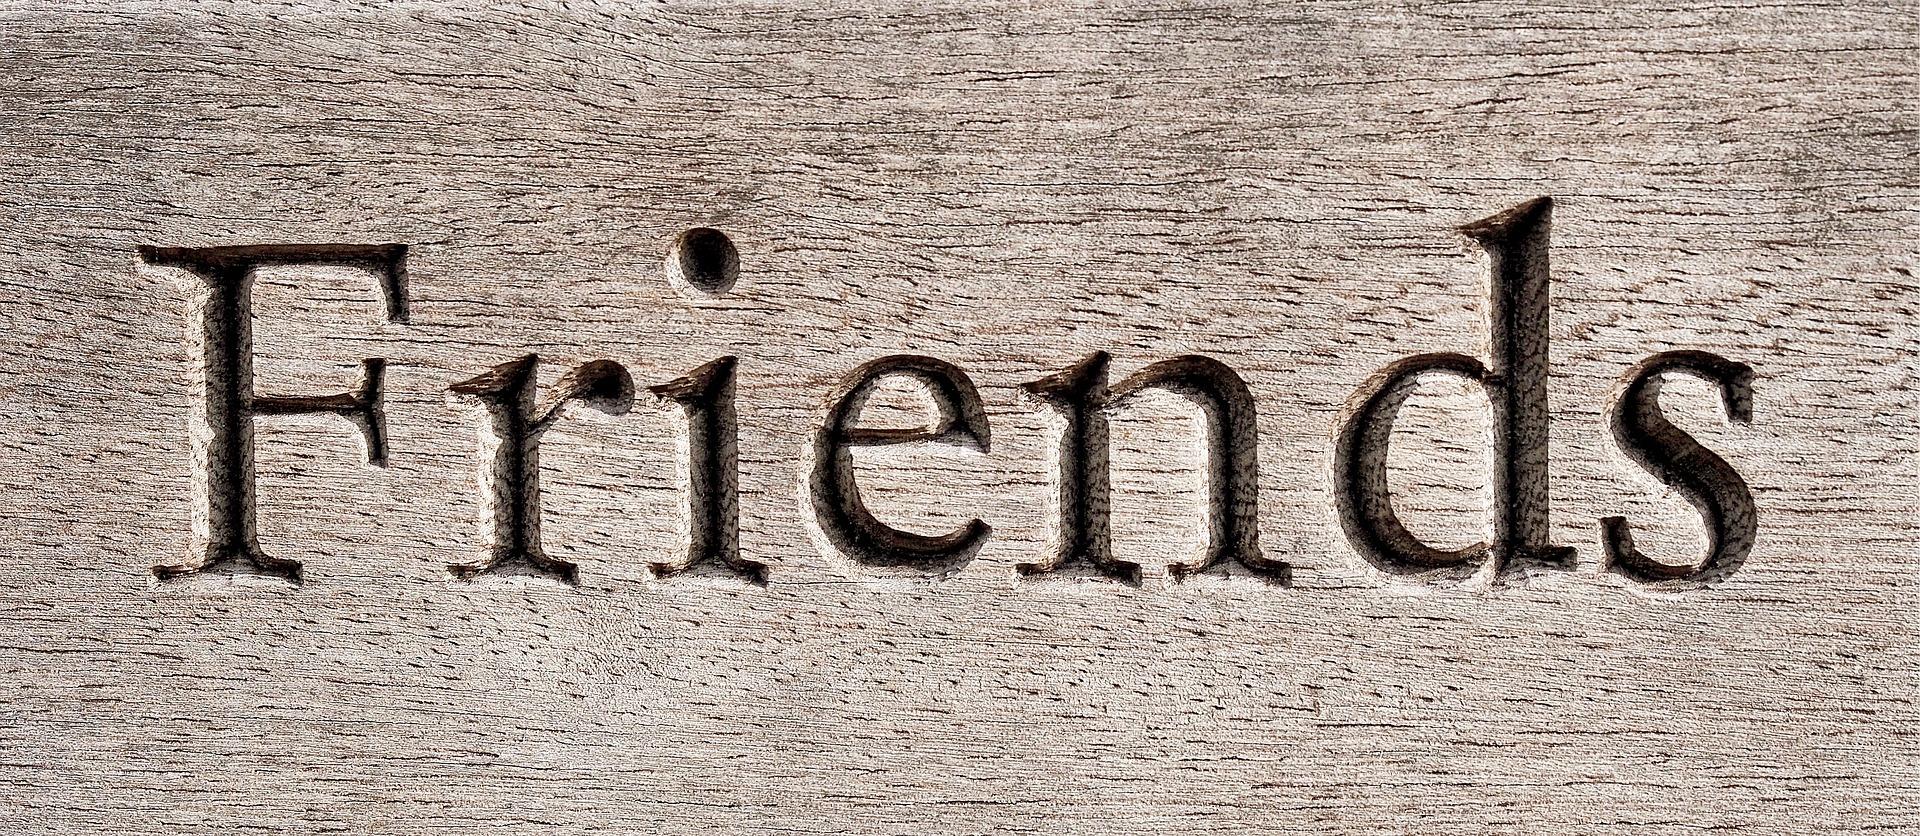 friend-1753870_1920